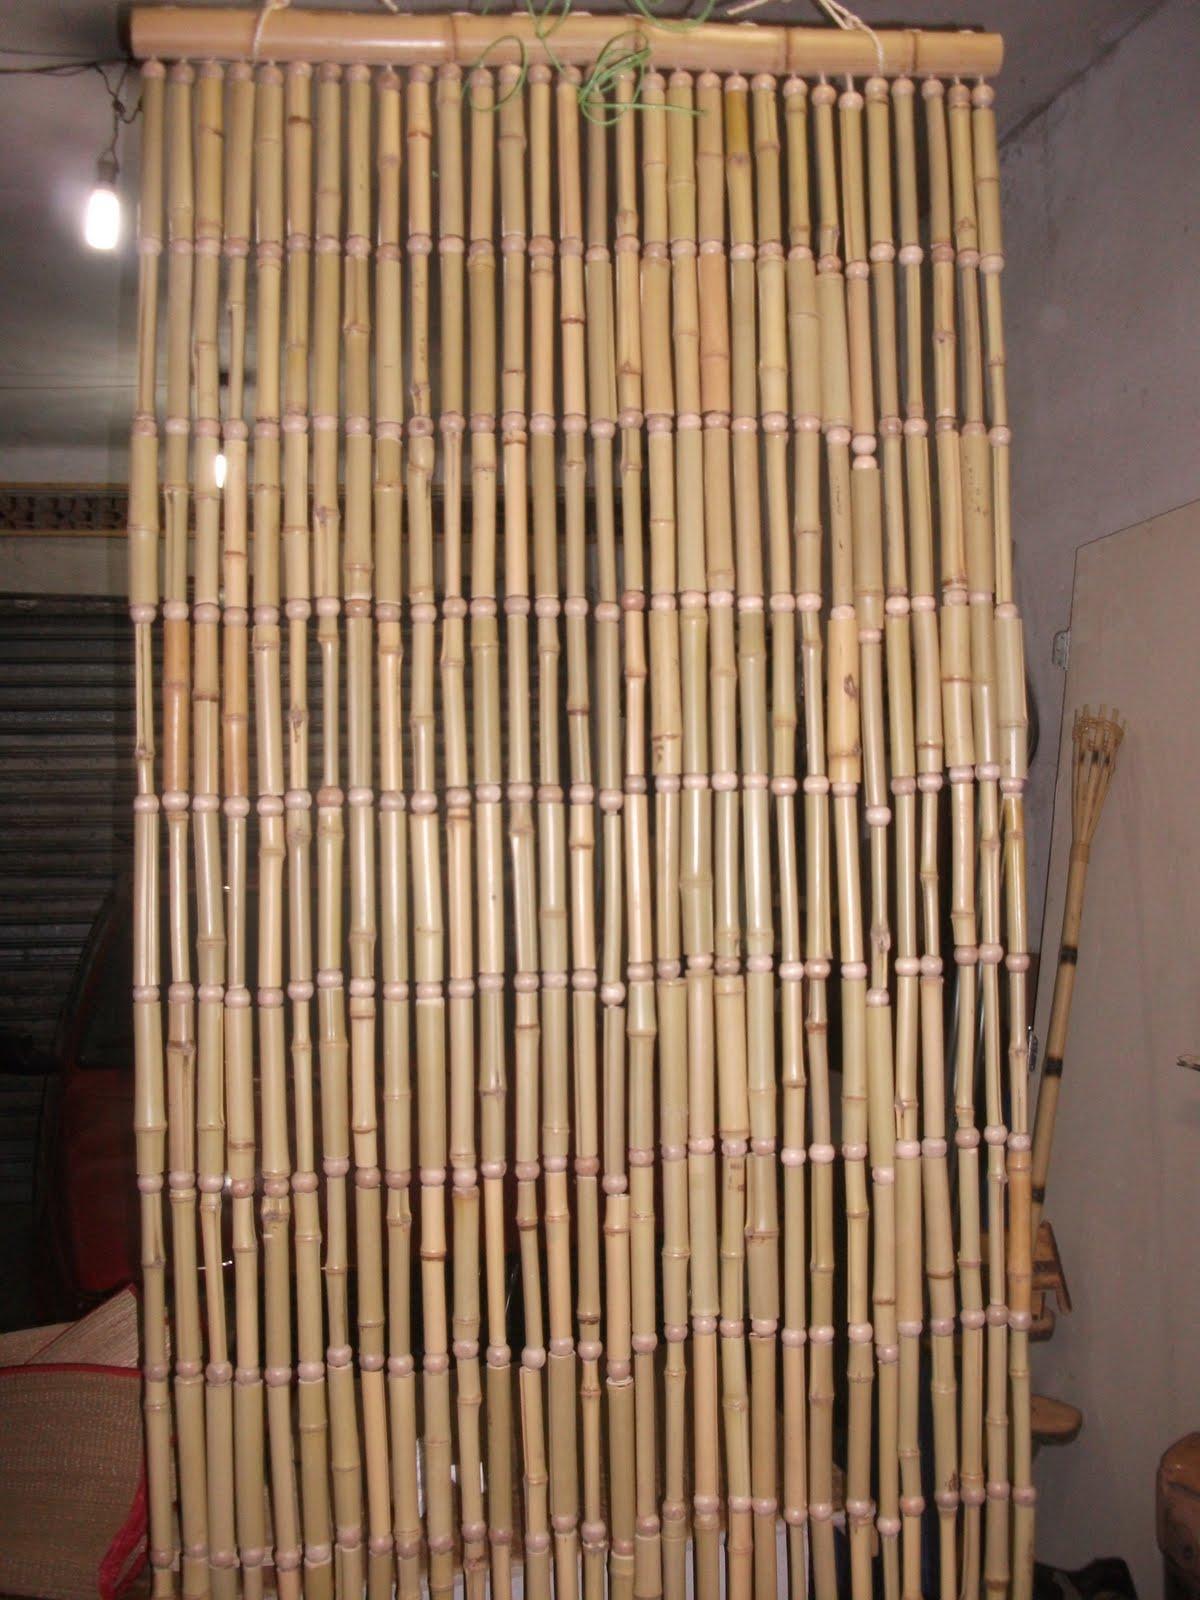 Cortinas de bambu para puertas ikea decoraci n del hogar for Cortinas para puertas exteriores ikea